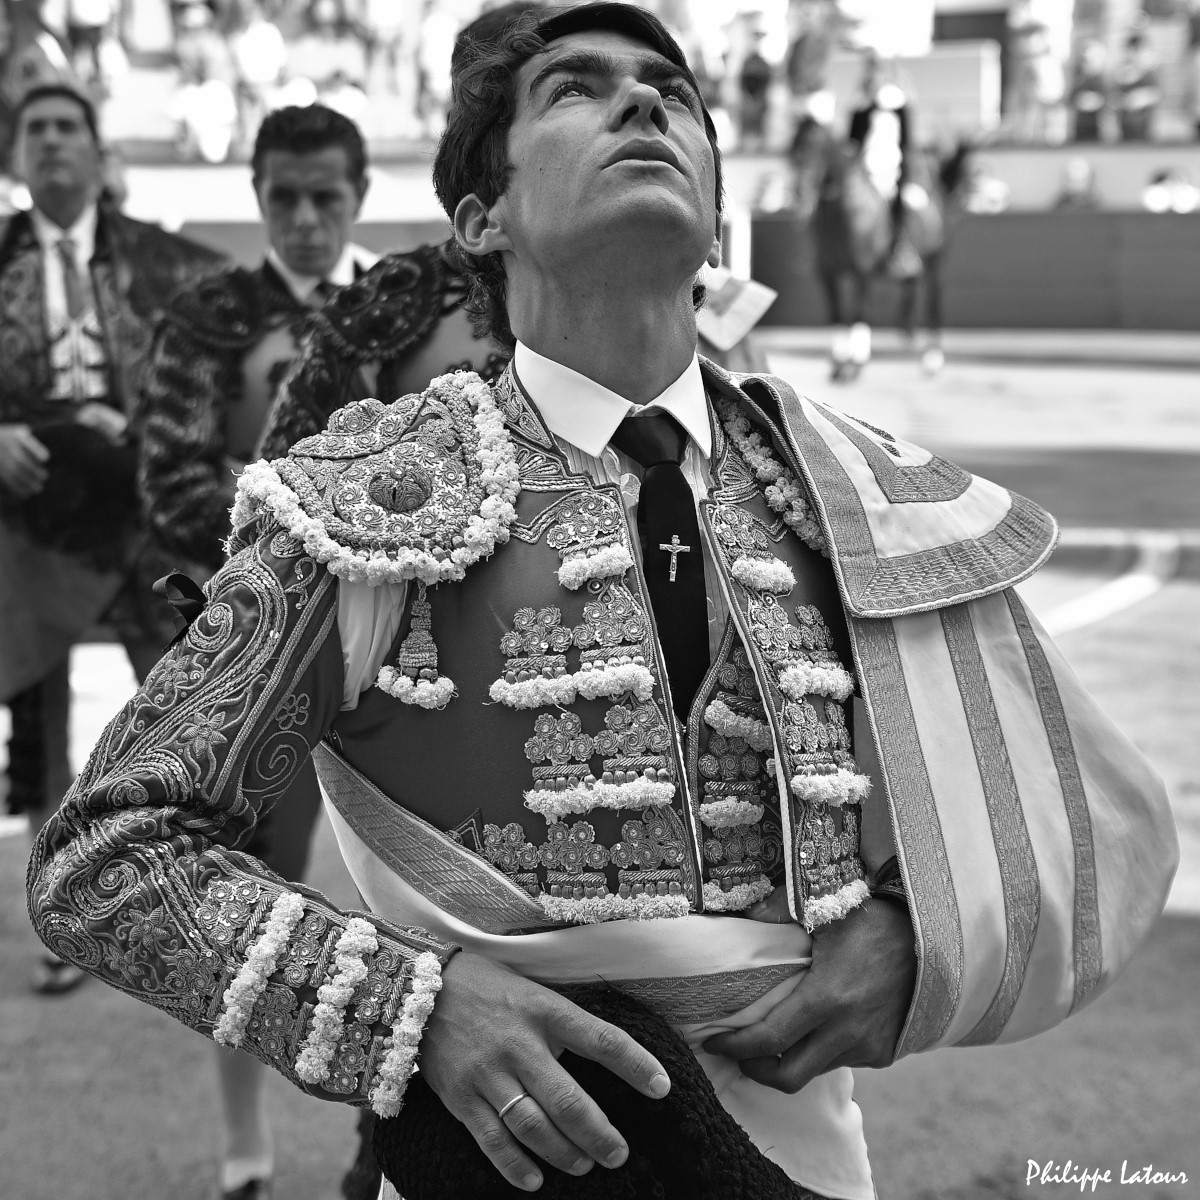 Domingo Lopez Chaves ©philippelatour